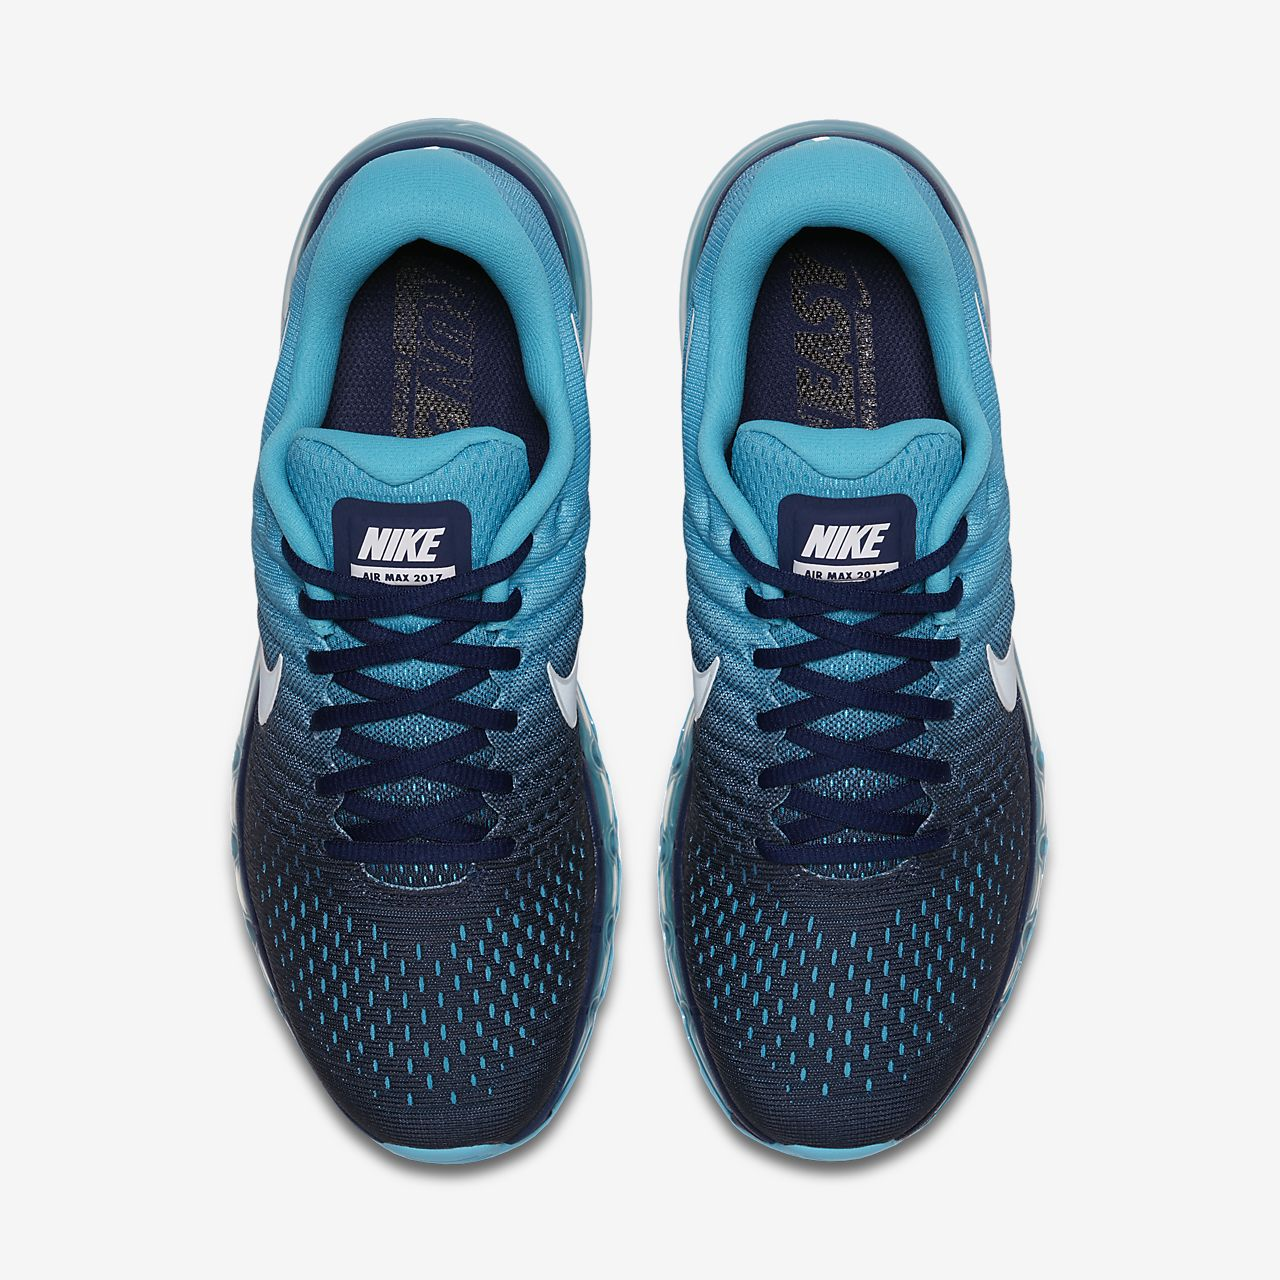 brand new bf7dc 56bd7 ... Nike Air Max 2017 Men s Shoe